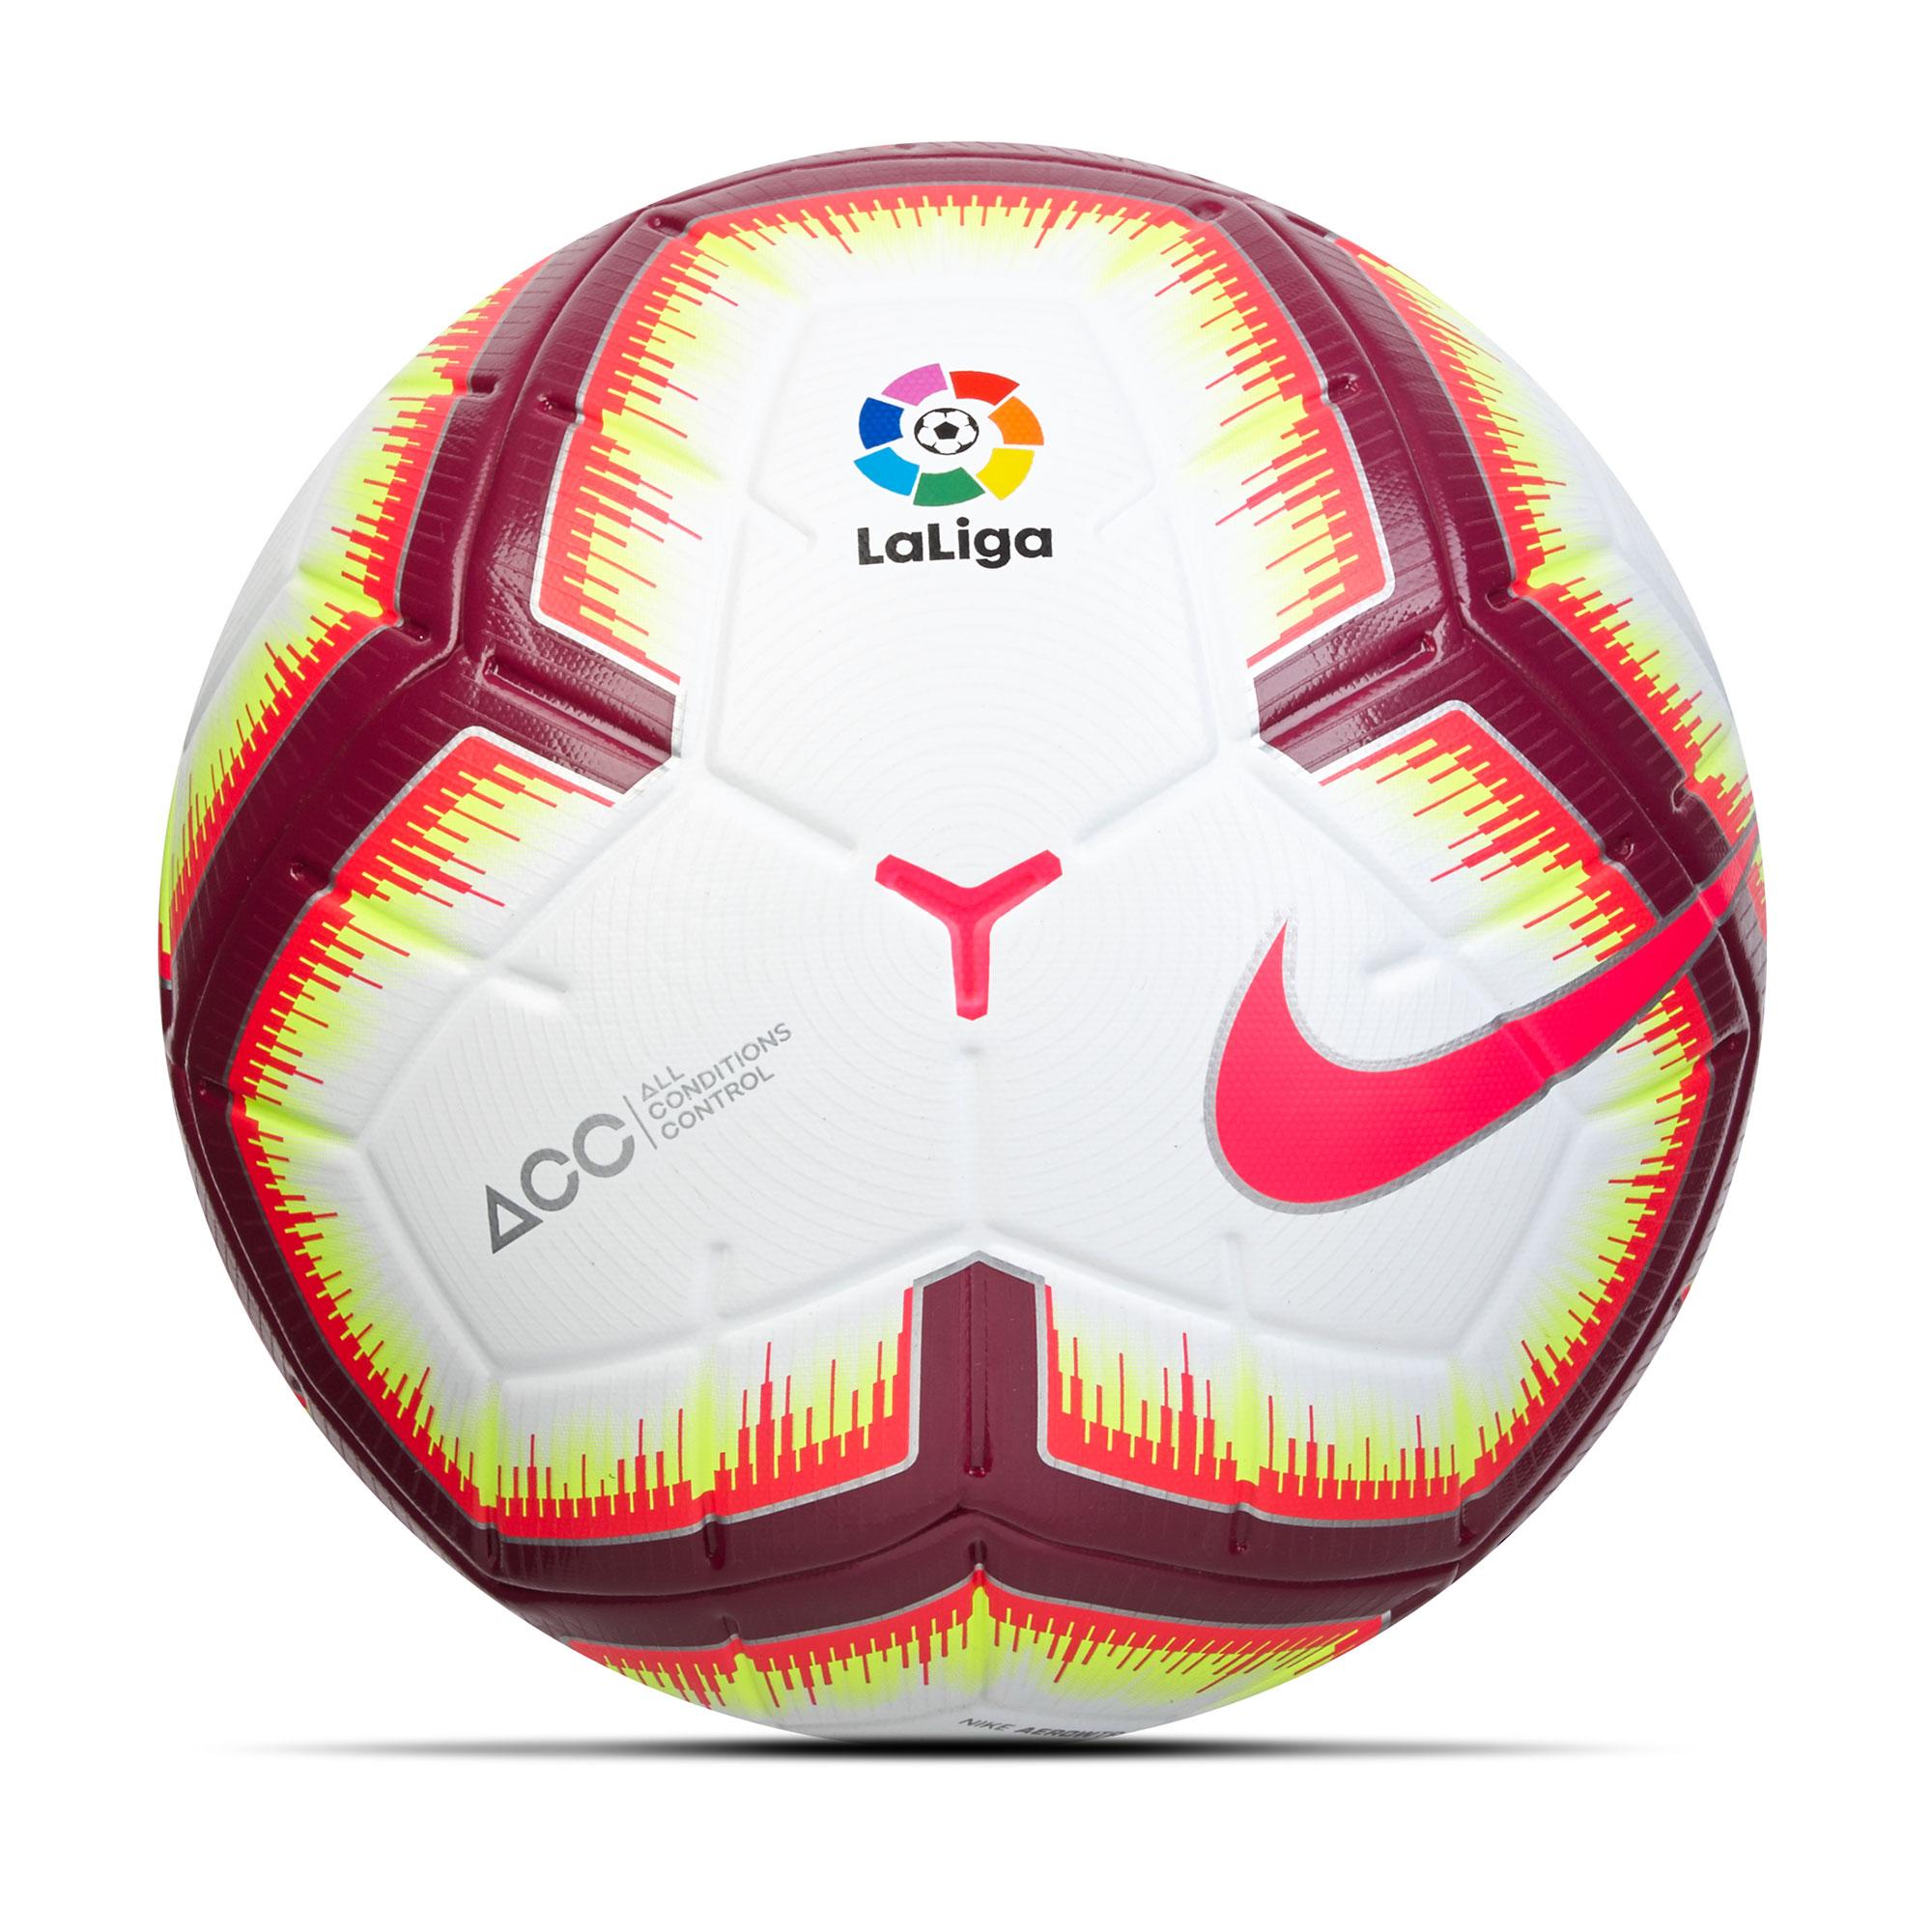 La Liga: Nike 18/19 La Liga Merlin Official Match Football